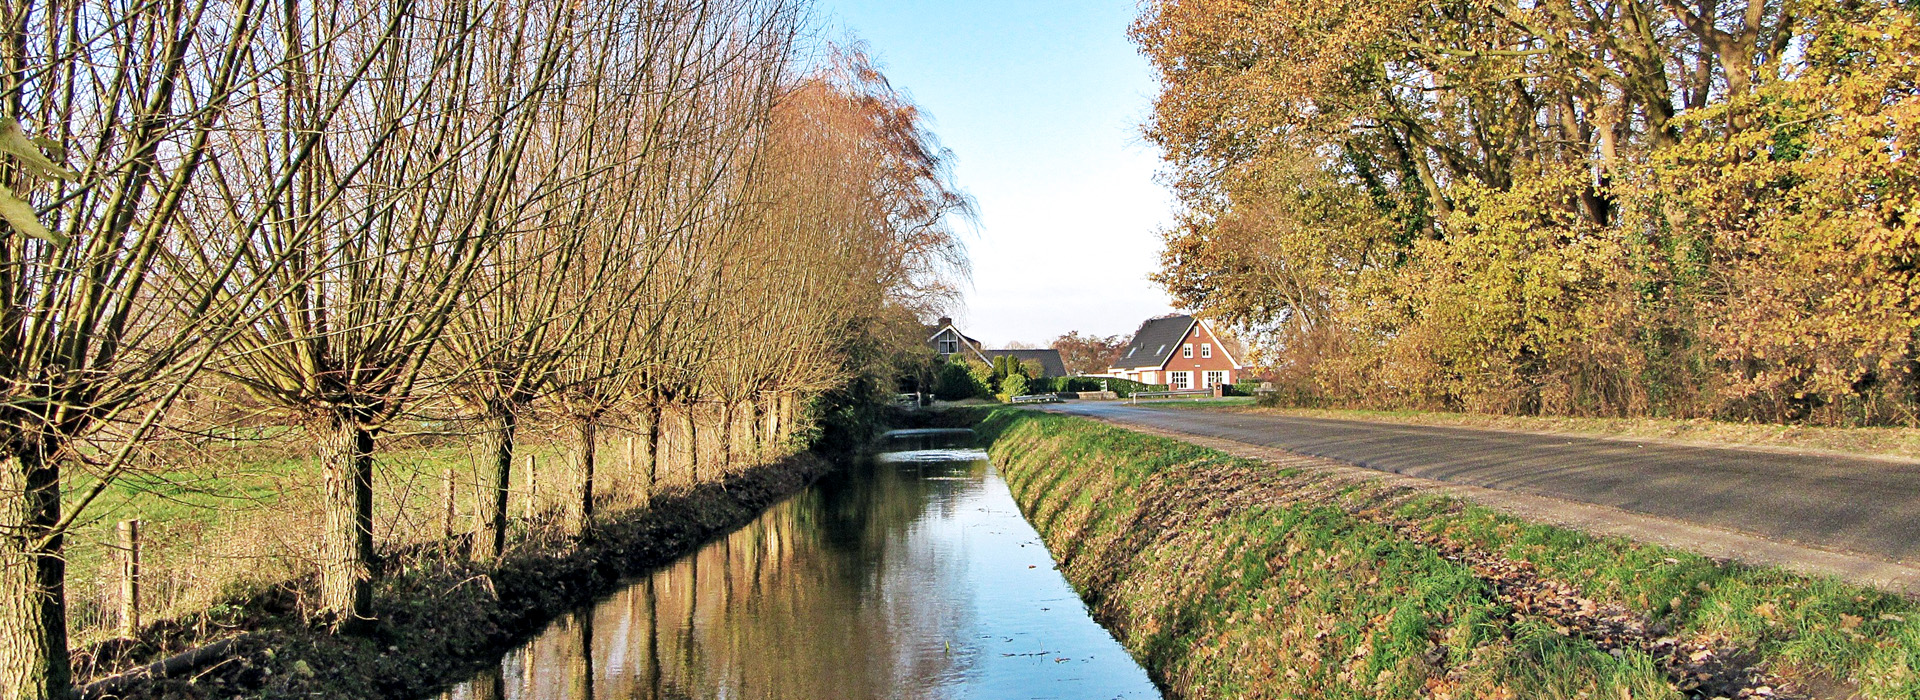 nature in Zoetermeer